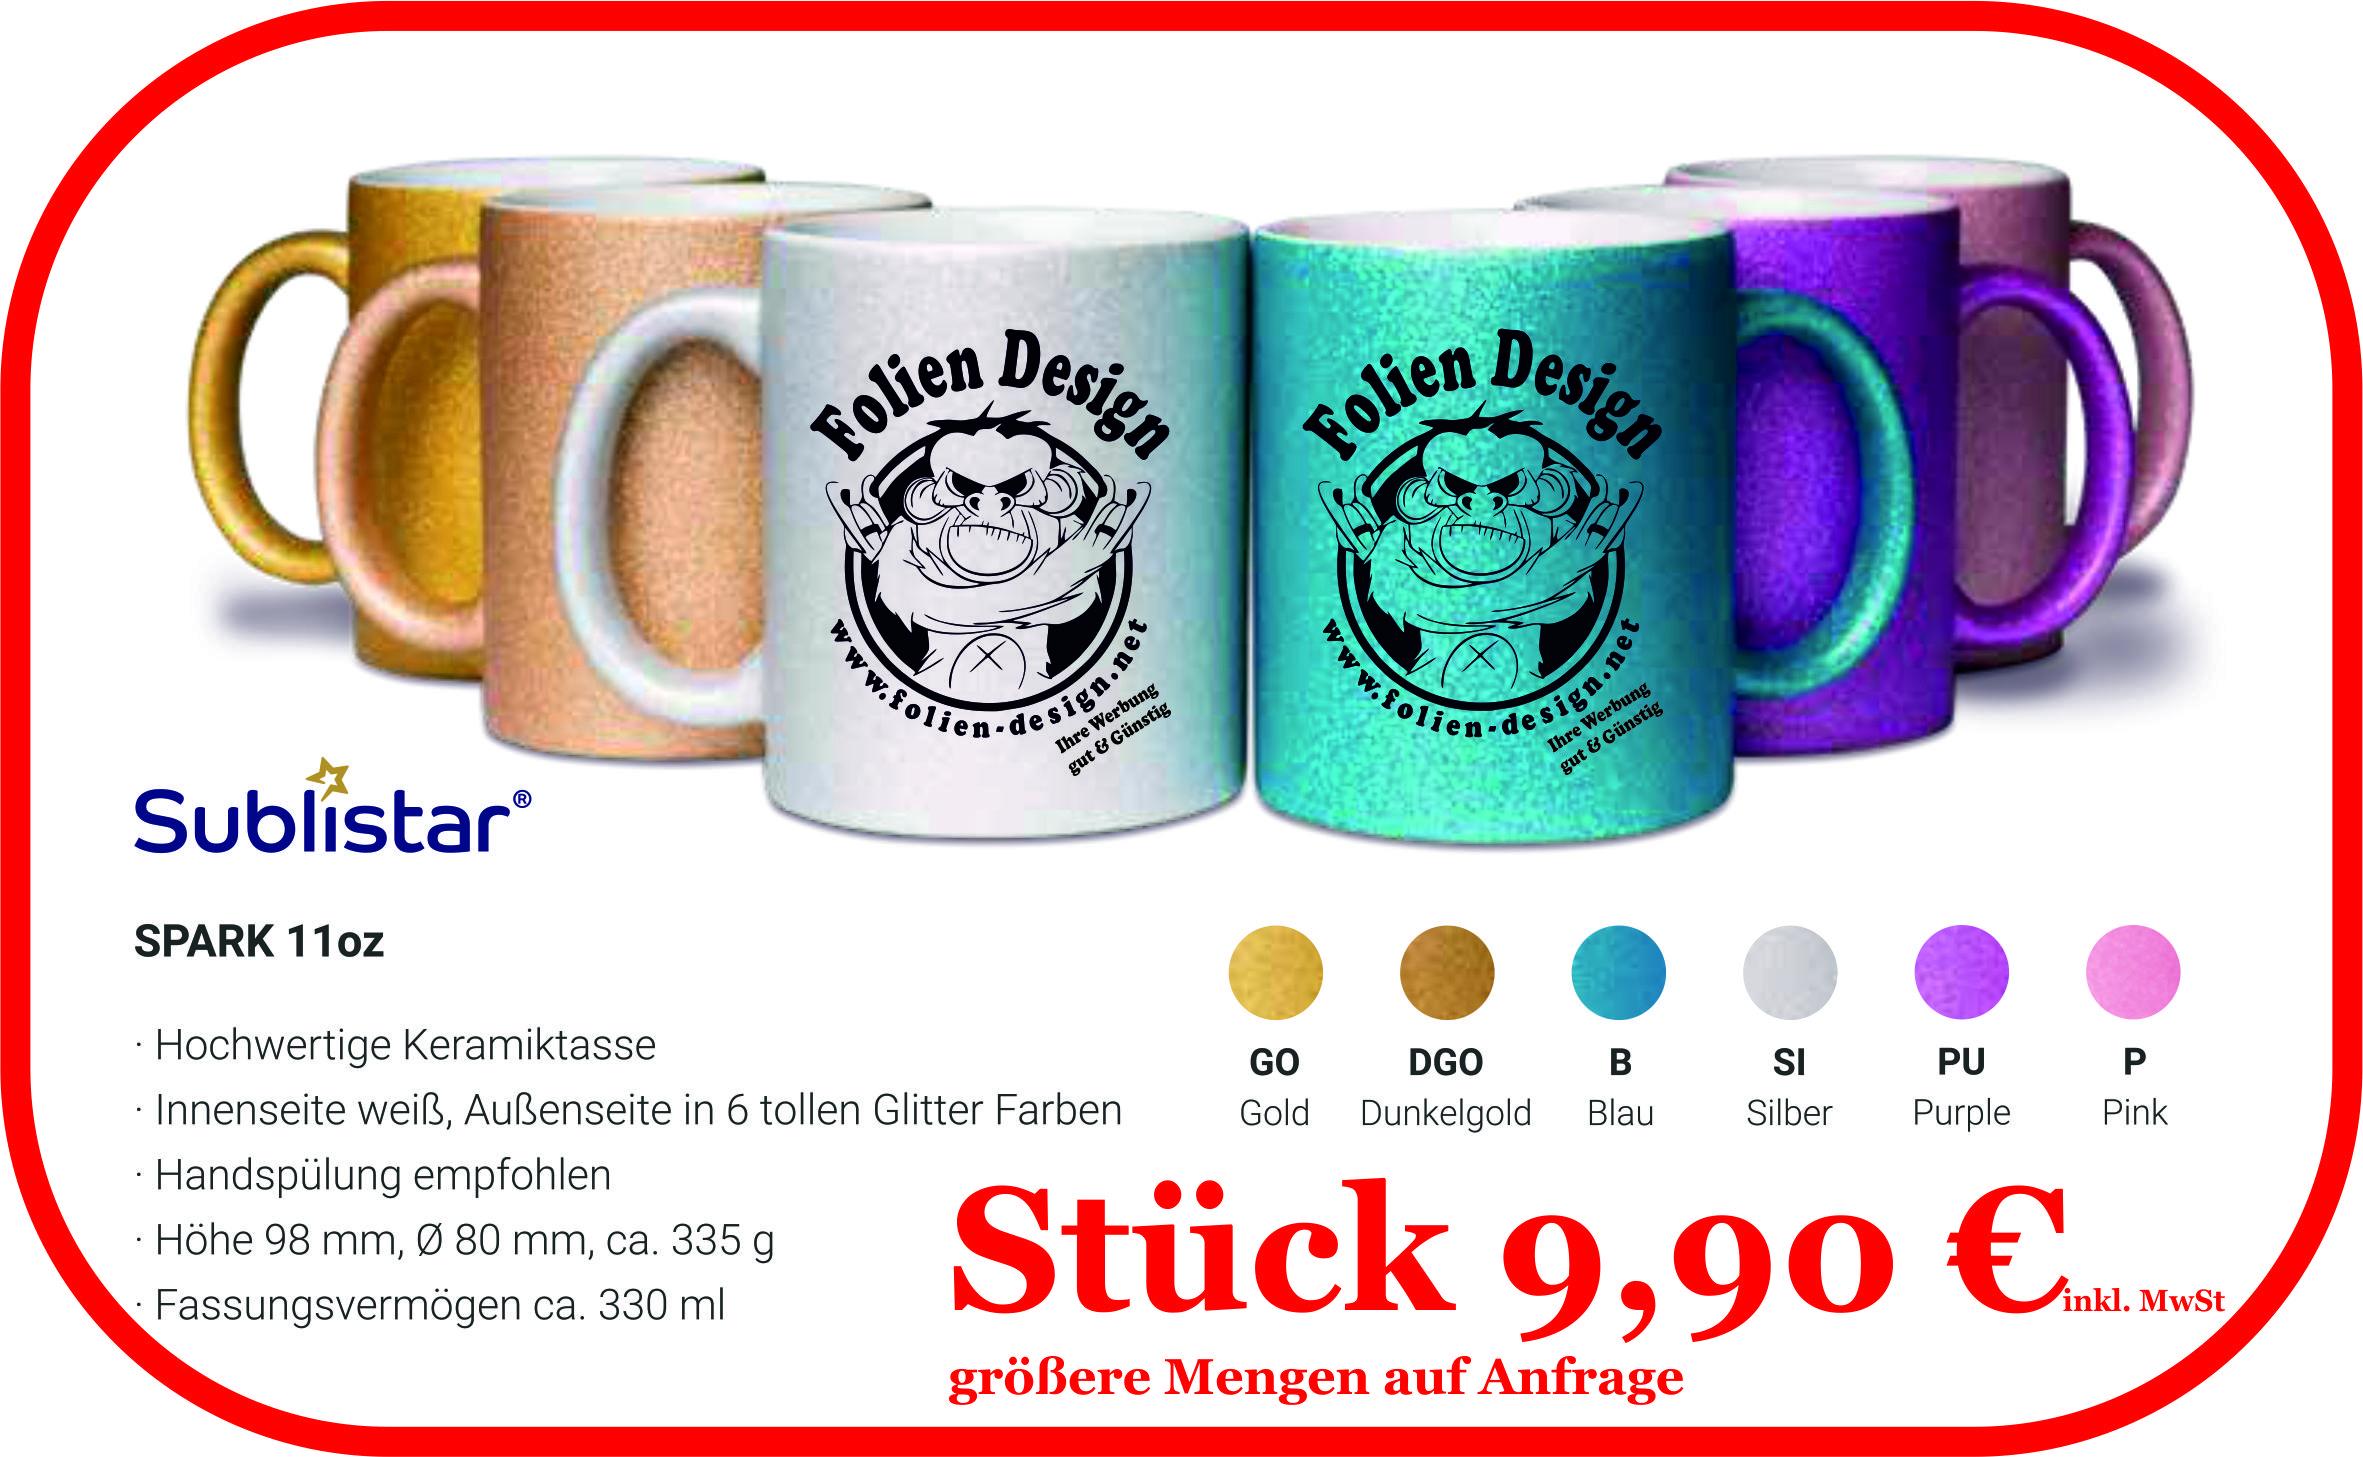 Keramiktasse 11oz Glitzer in 6 Farben